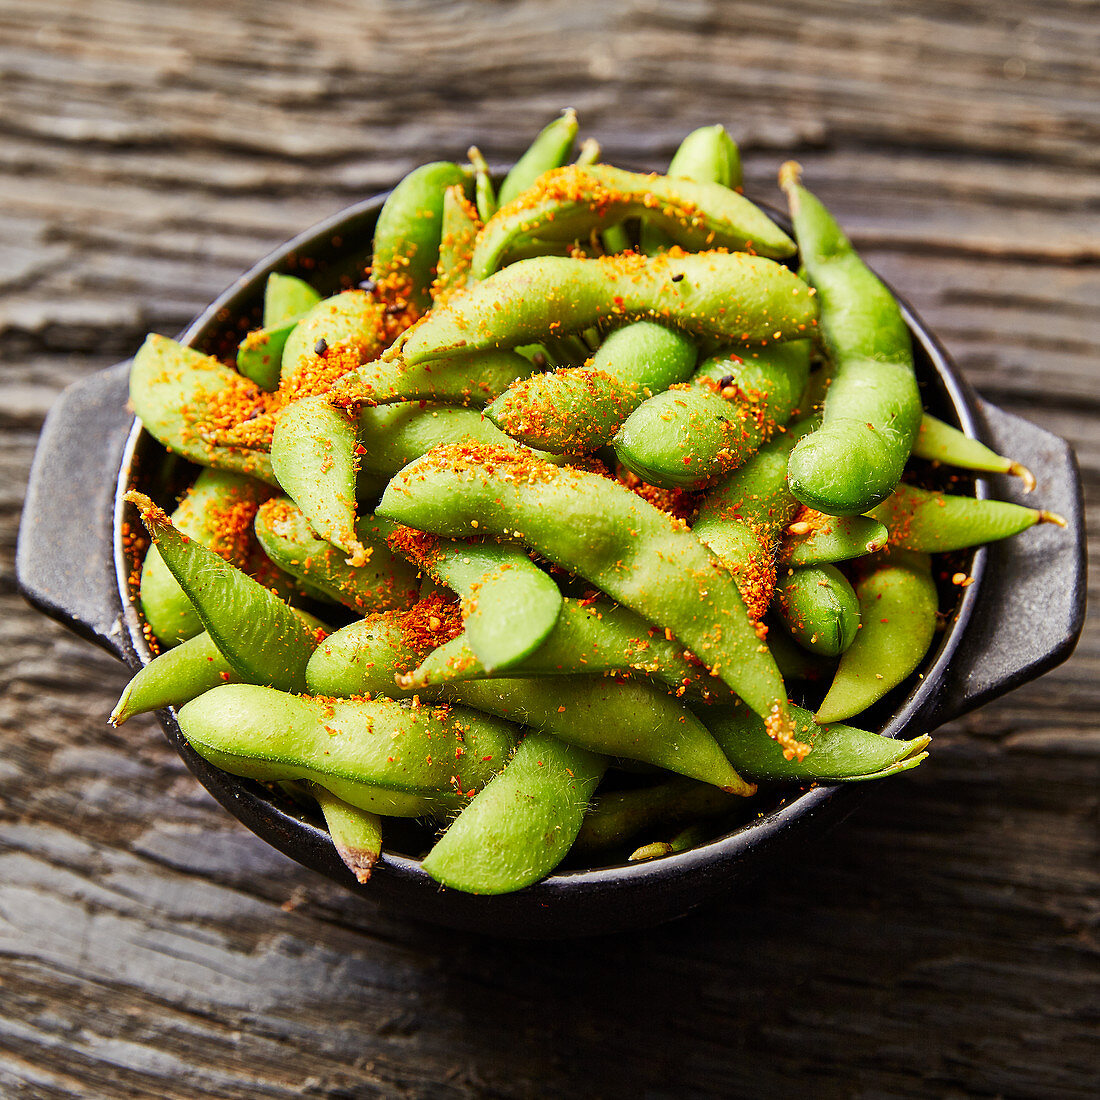 Edamame beans seasoned with chilli